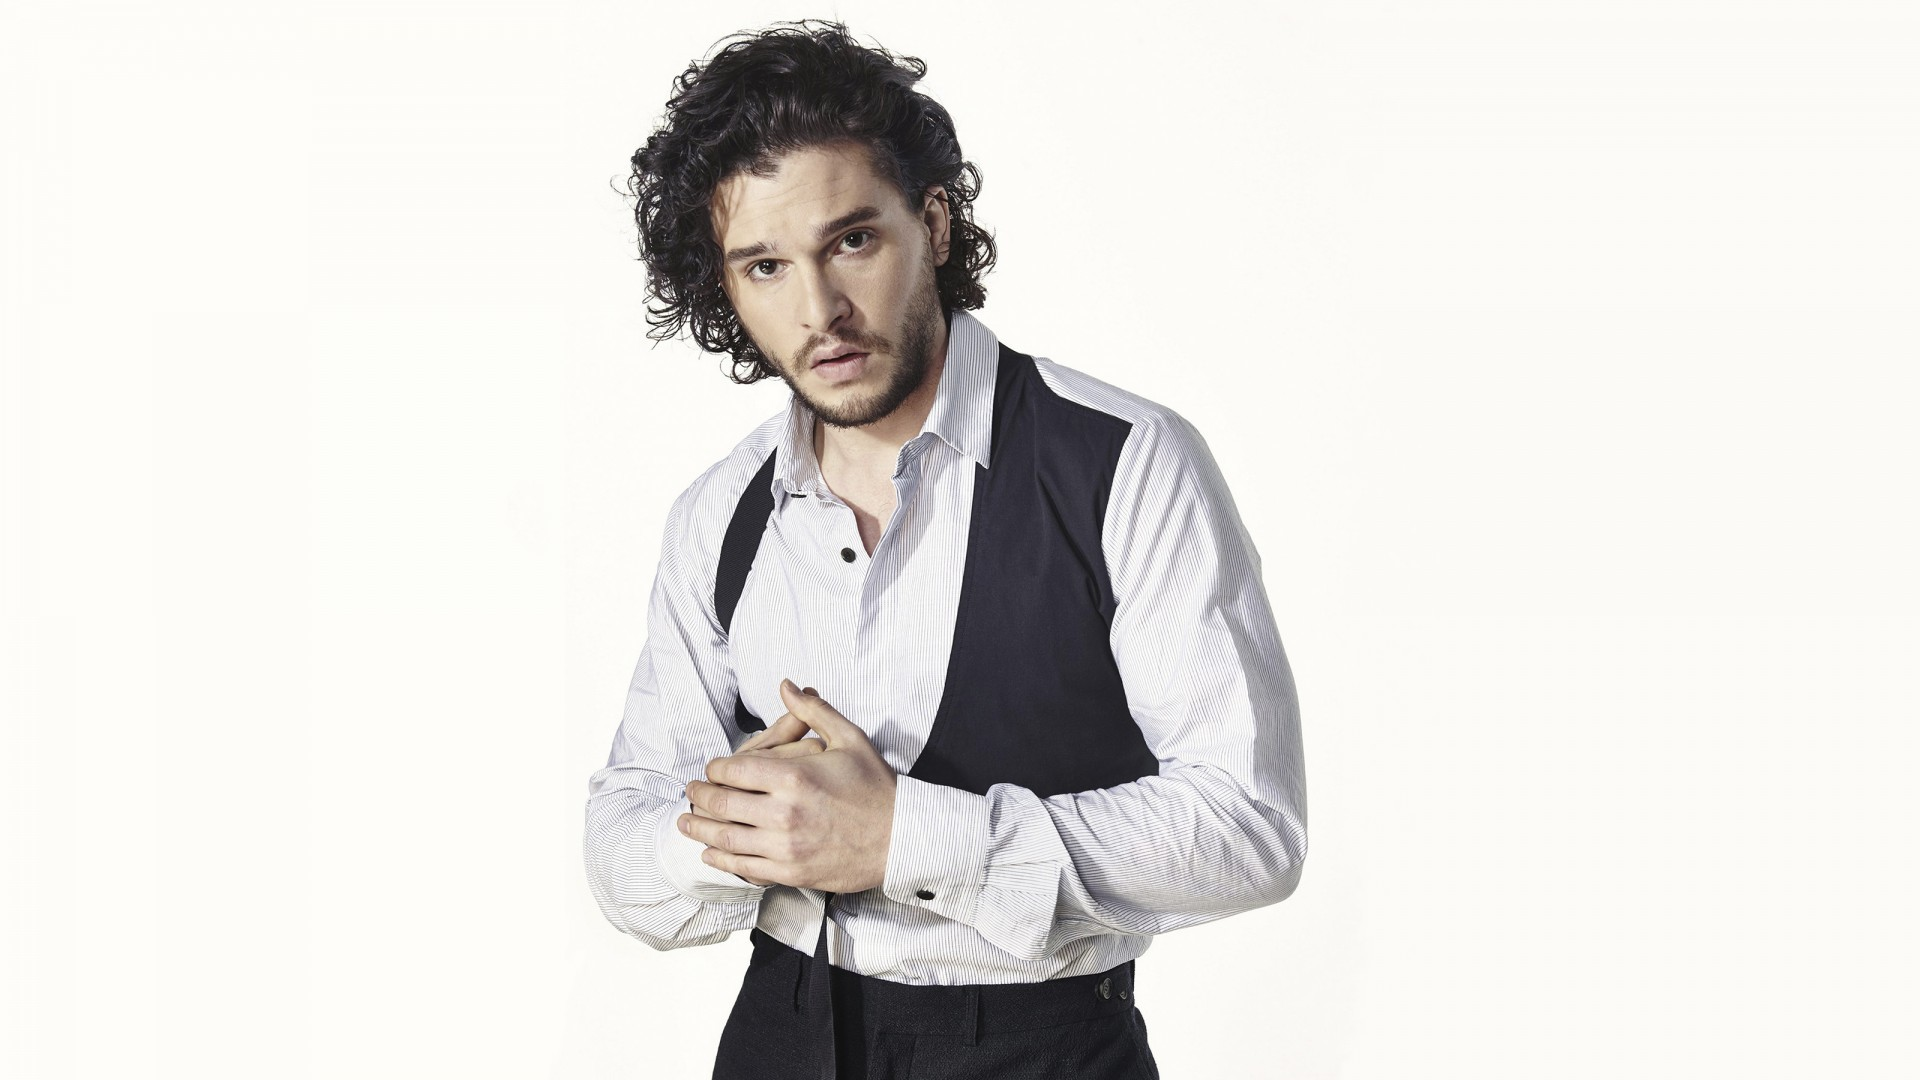 Wallpaper Kit Harington, English actor, Jon Snow, Game of Thrones,  Celebrities / Male, #937